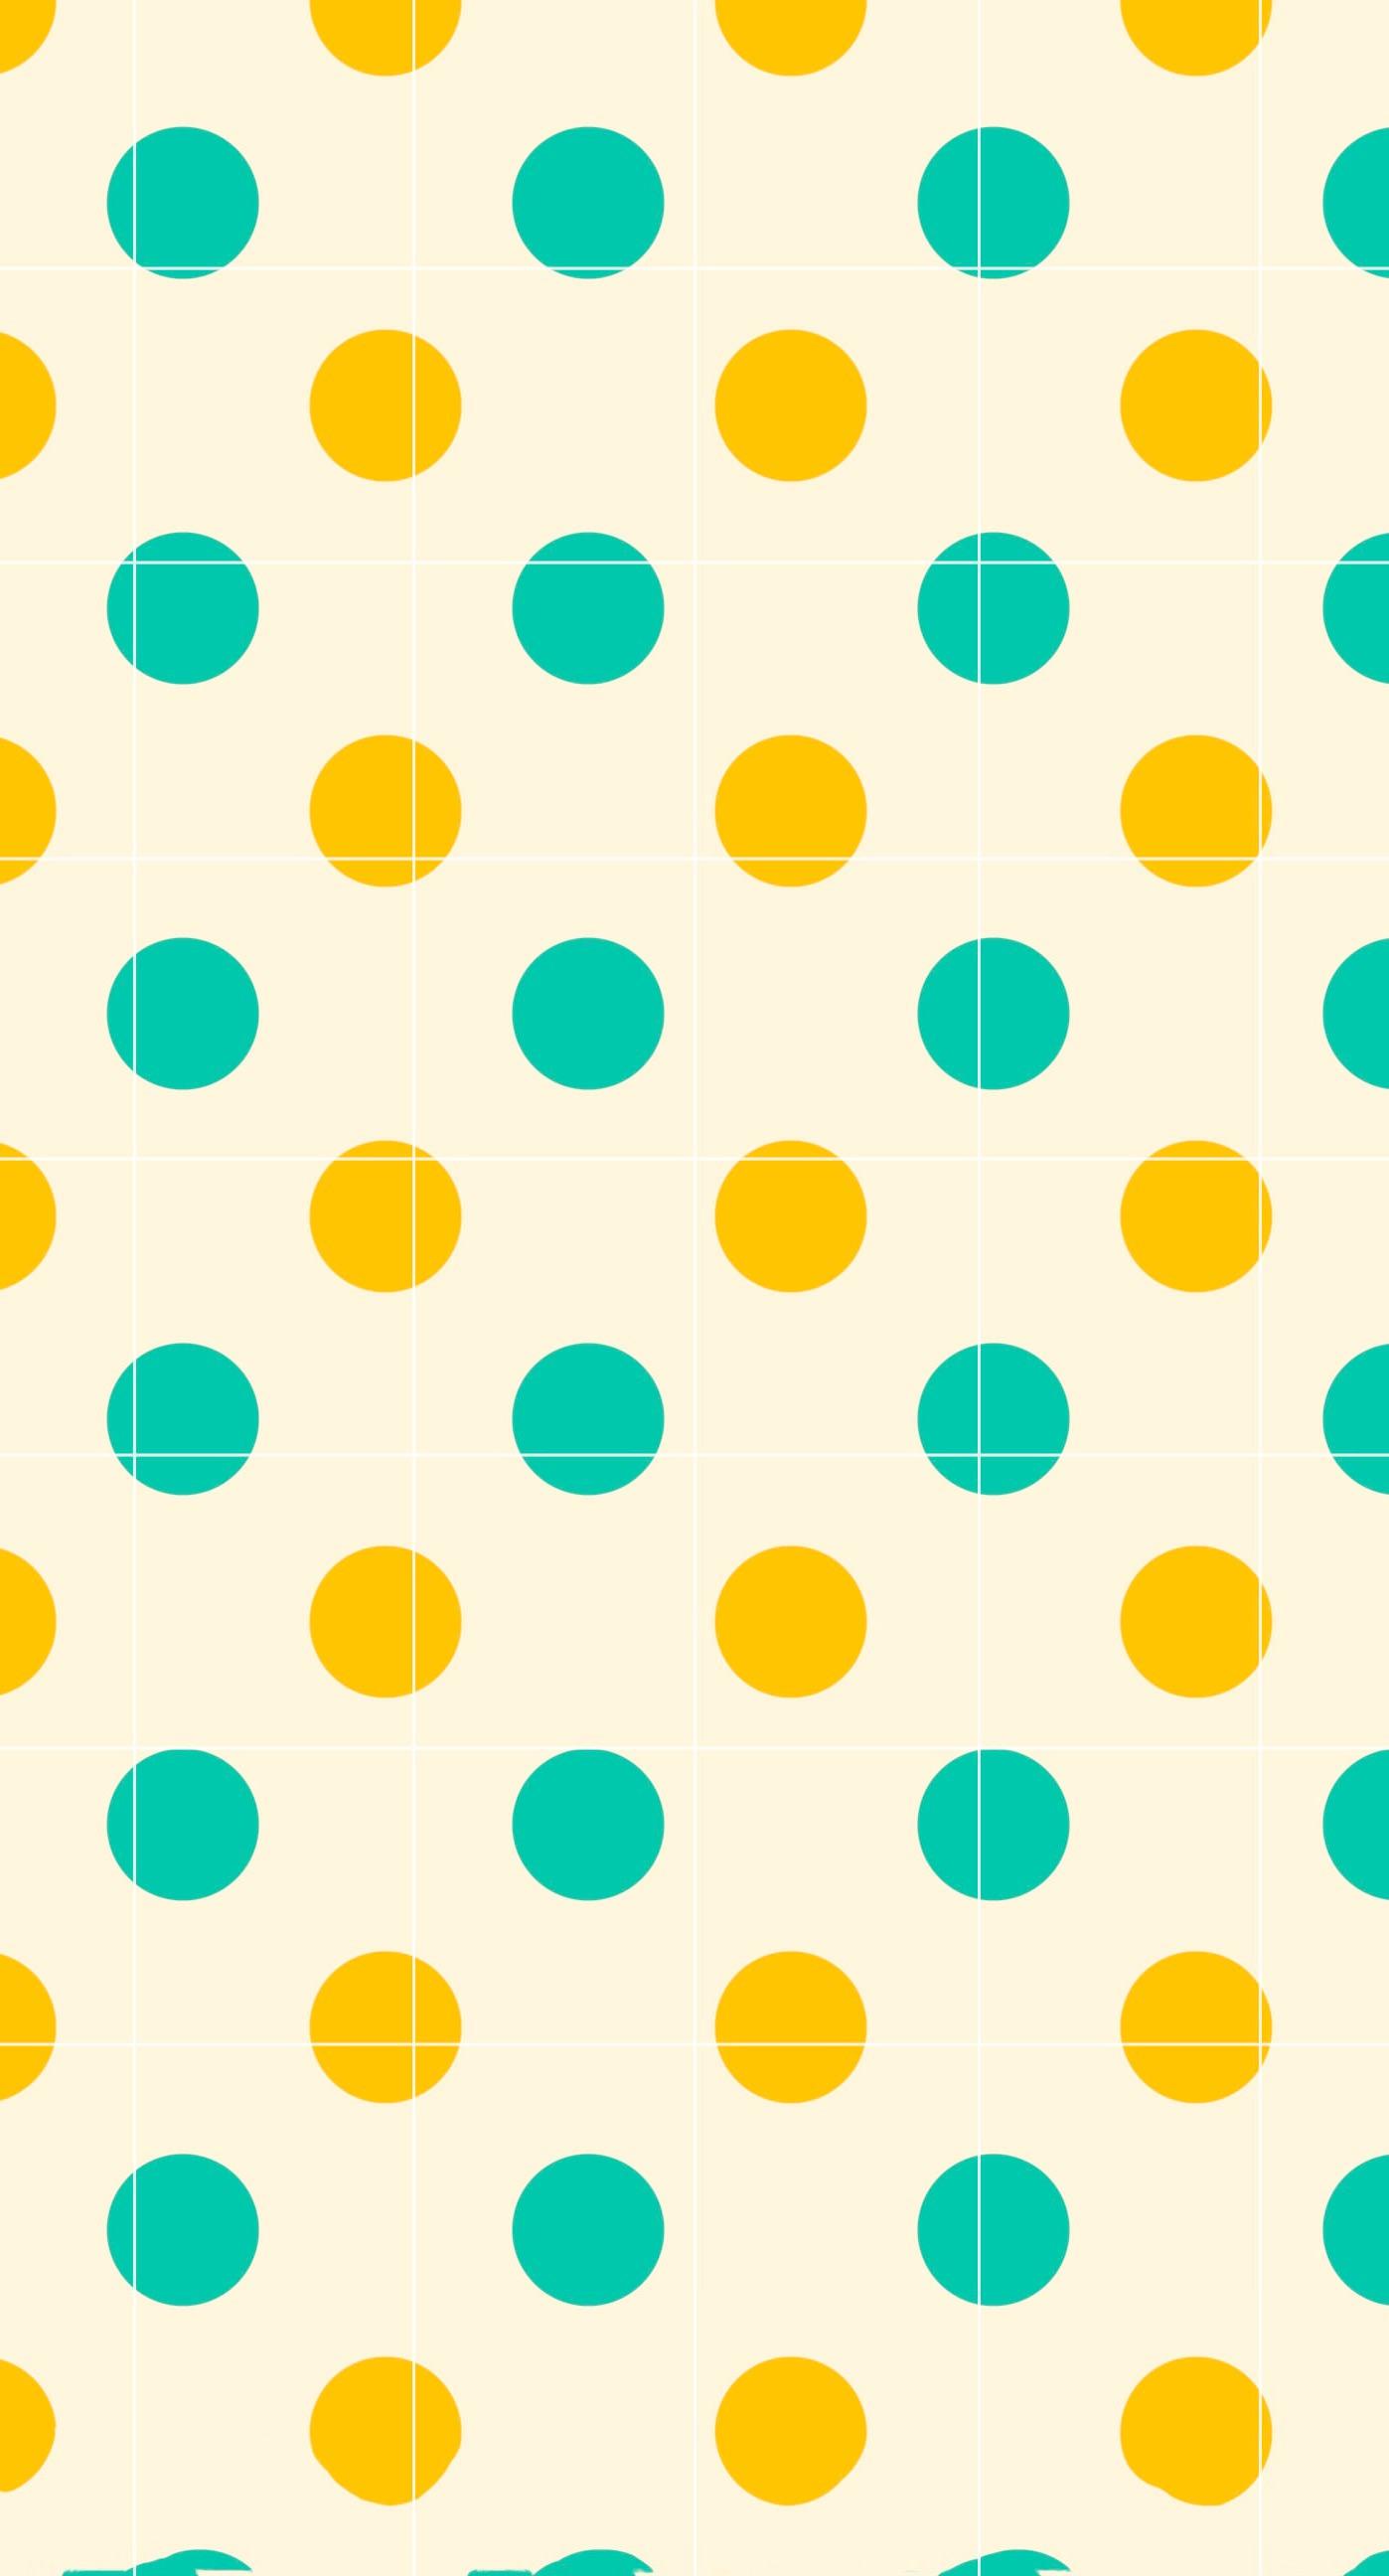 Polka Dot Green Orange Shelf Borders Wallpaper Sc Iphone7plus